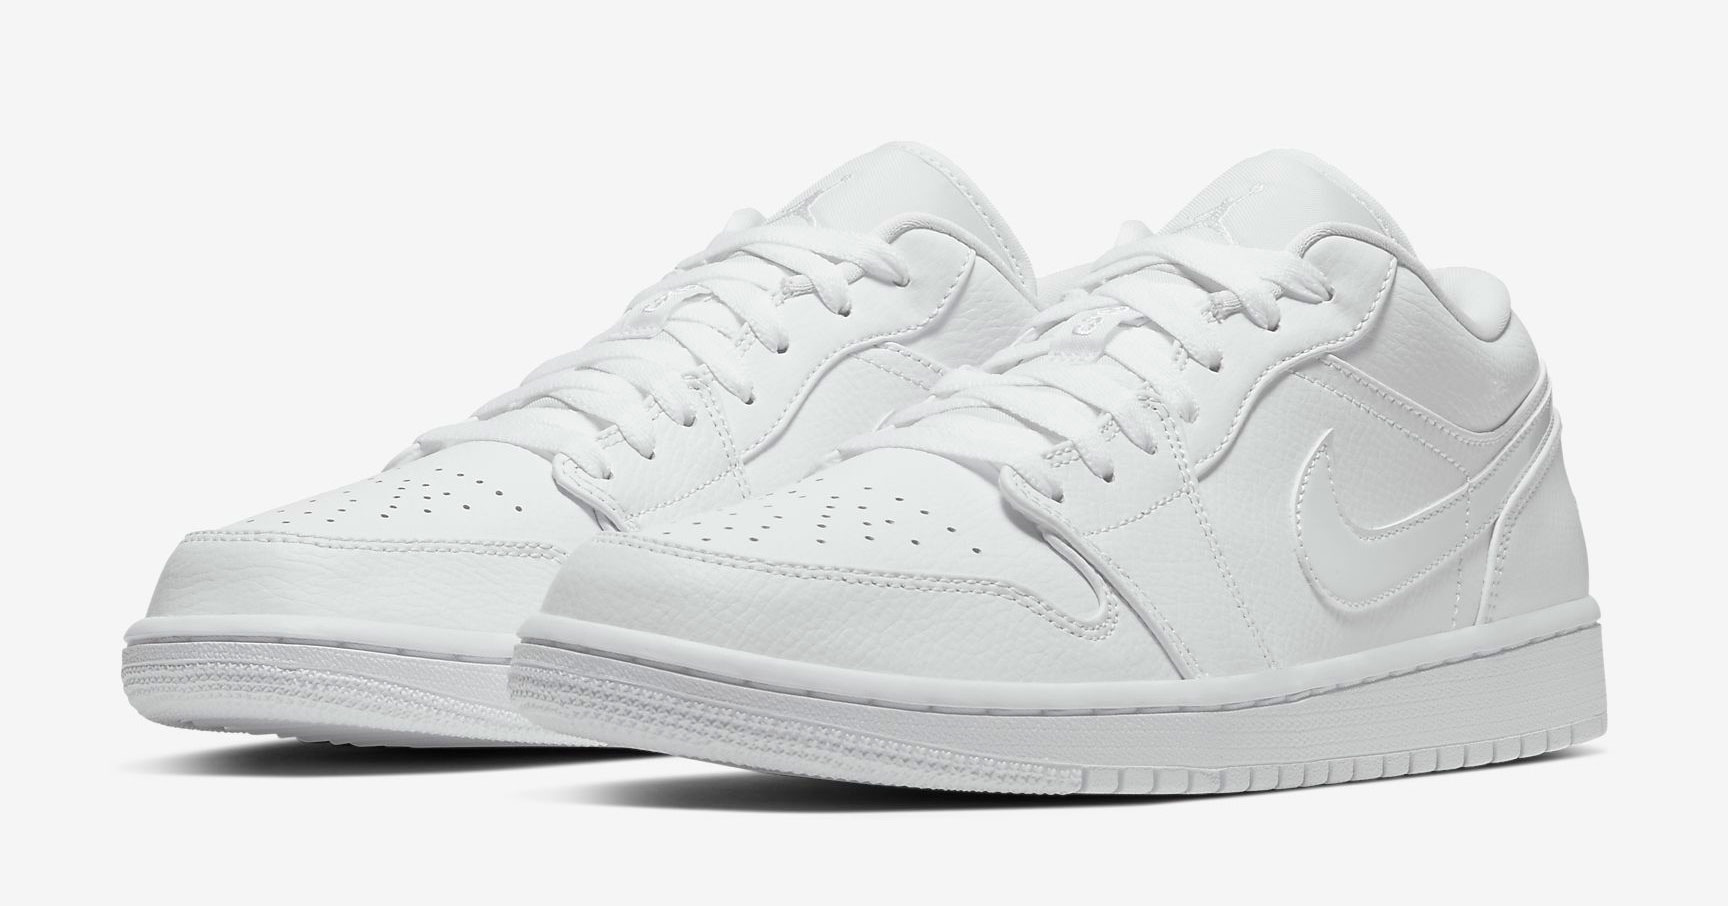 air-jordan-1-low-triple-white-release-date-1